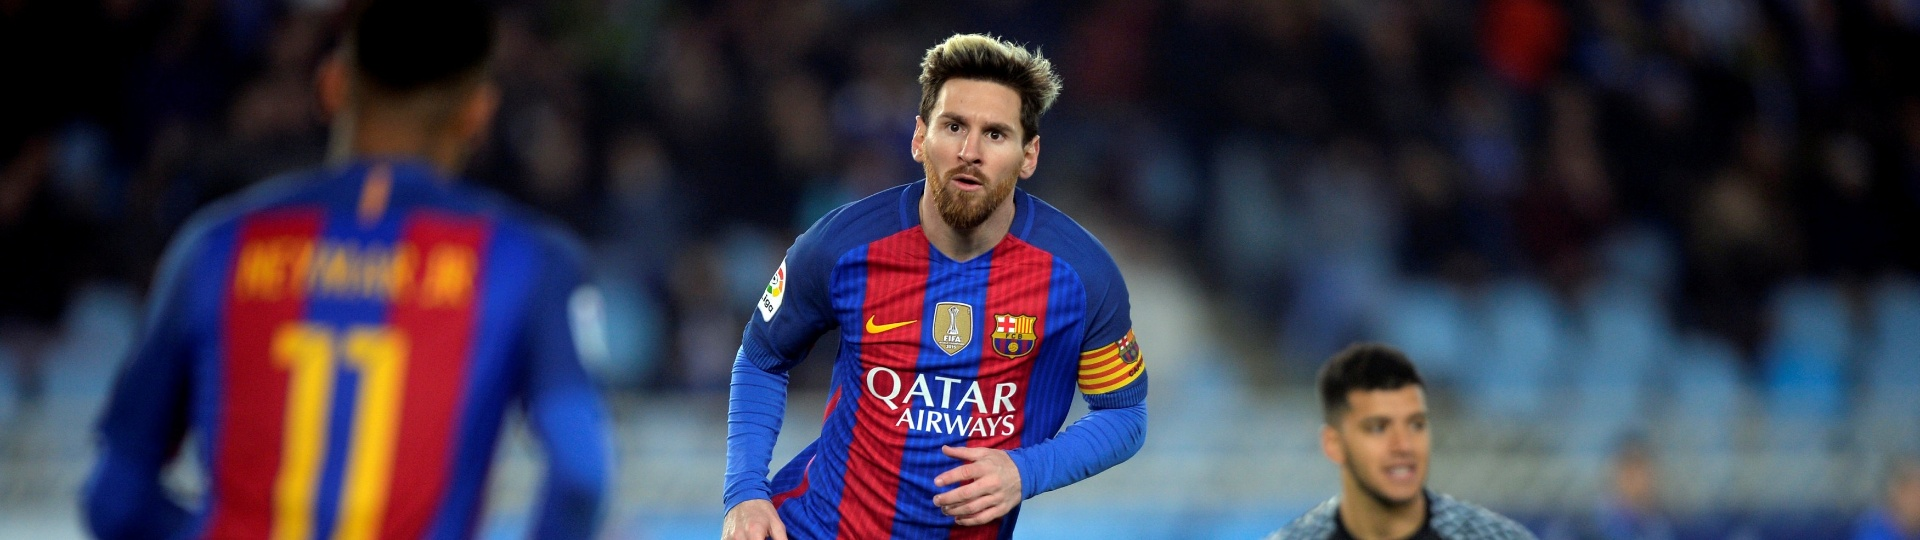 Messi comemora gol para o Barcelona contra a Real Sociedad